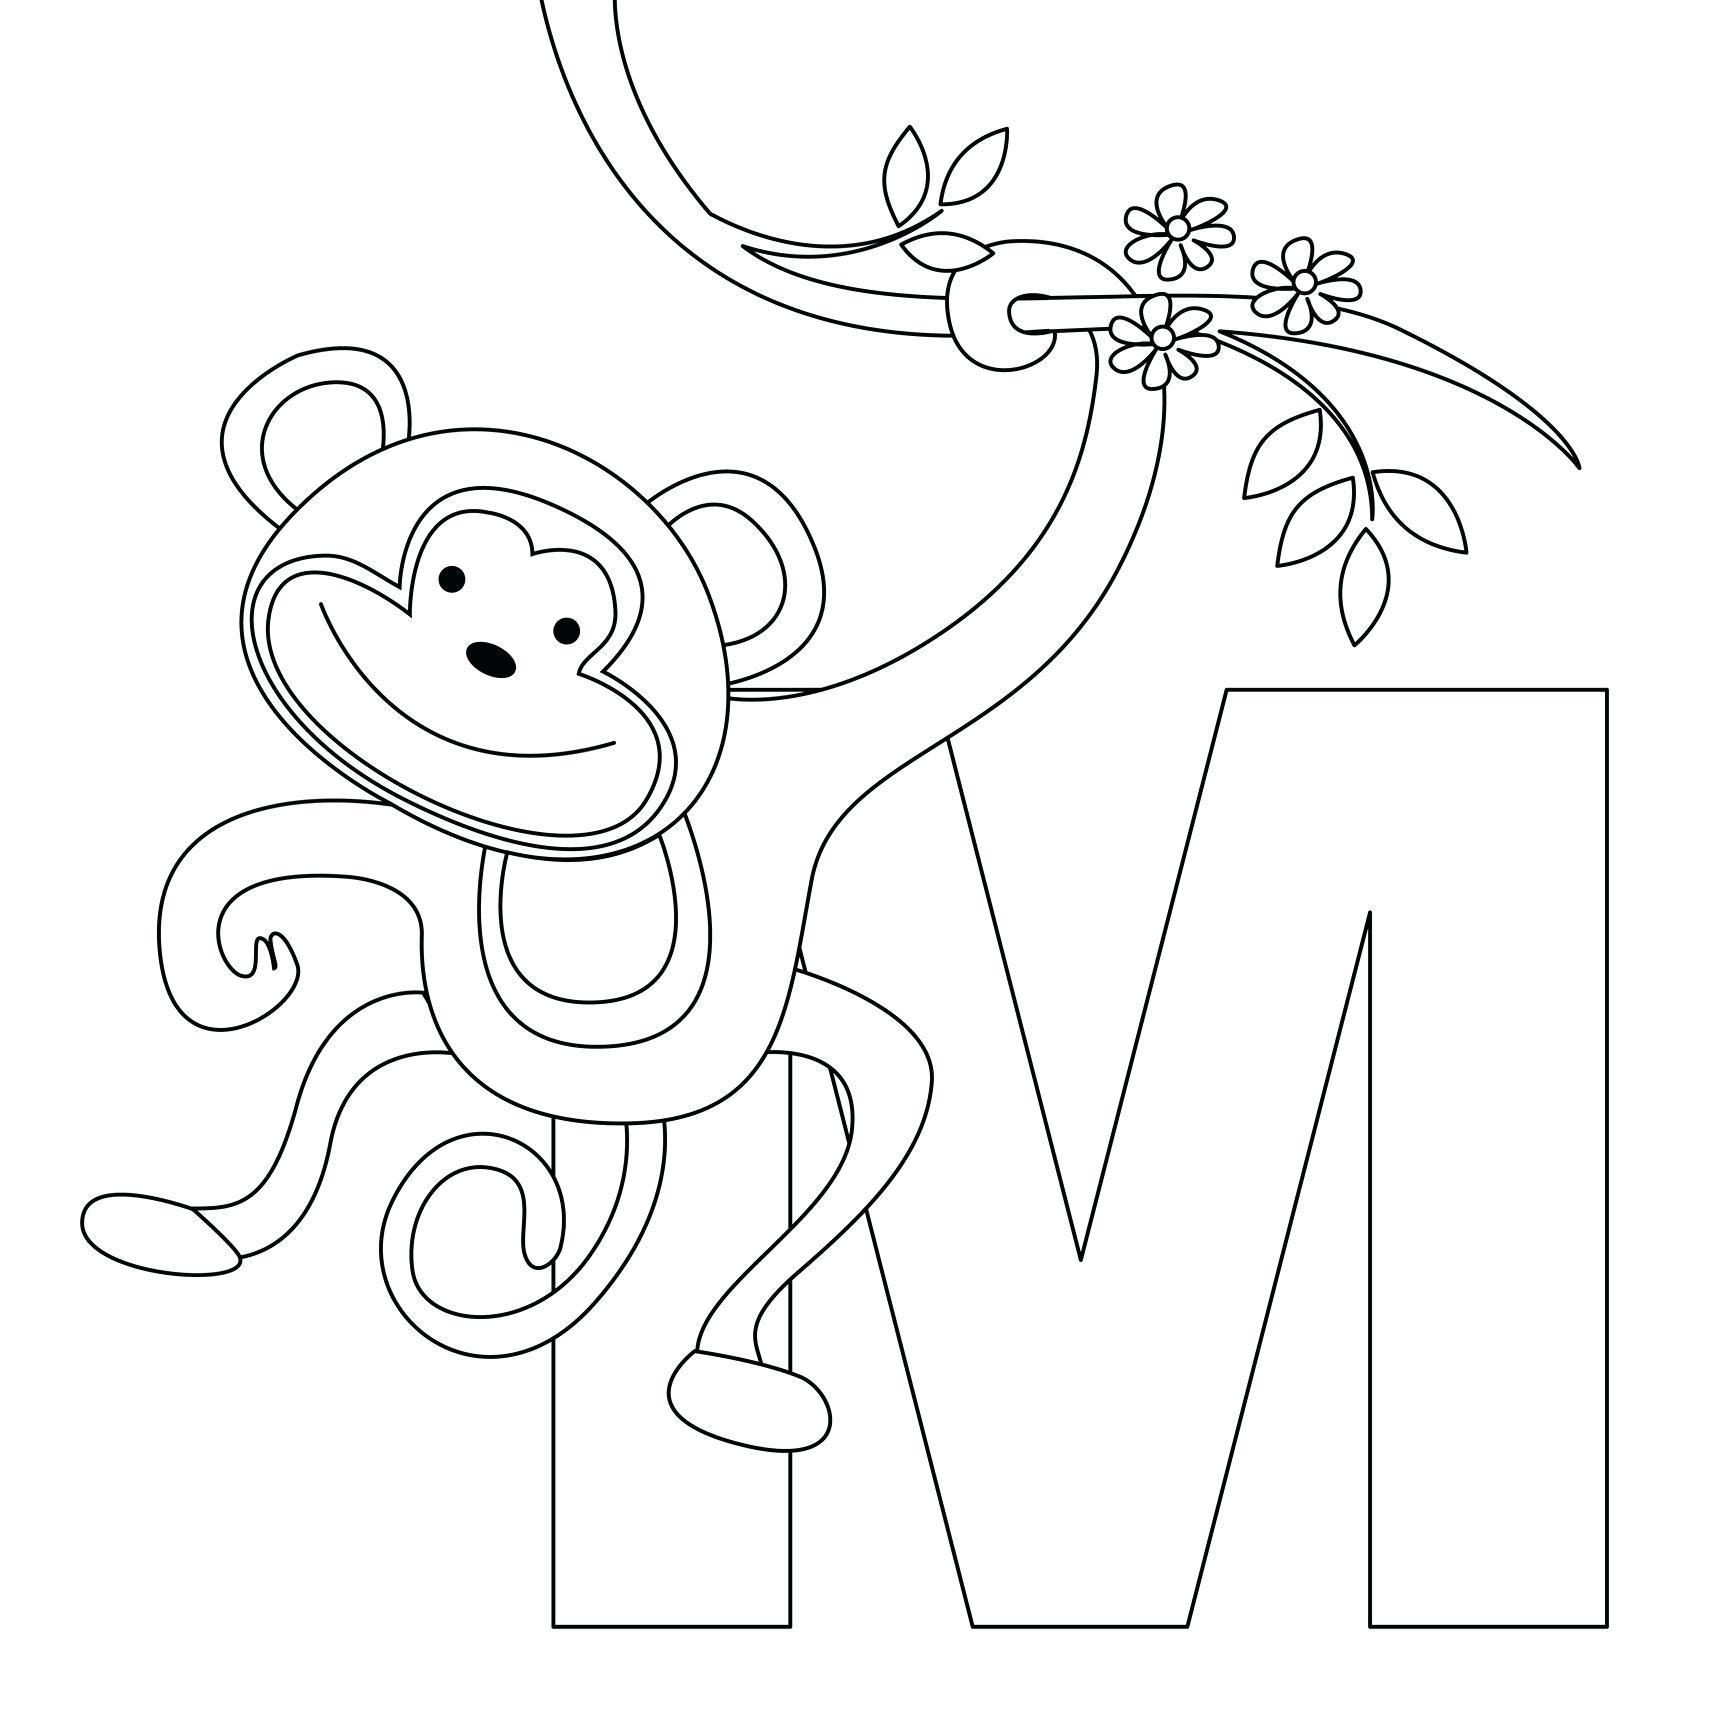 Alphabet Coloring Worksheets Pdf | AlphabetWorksheetsFree.com